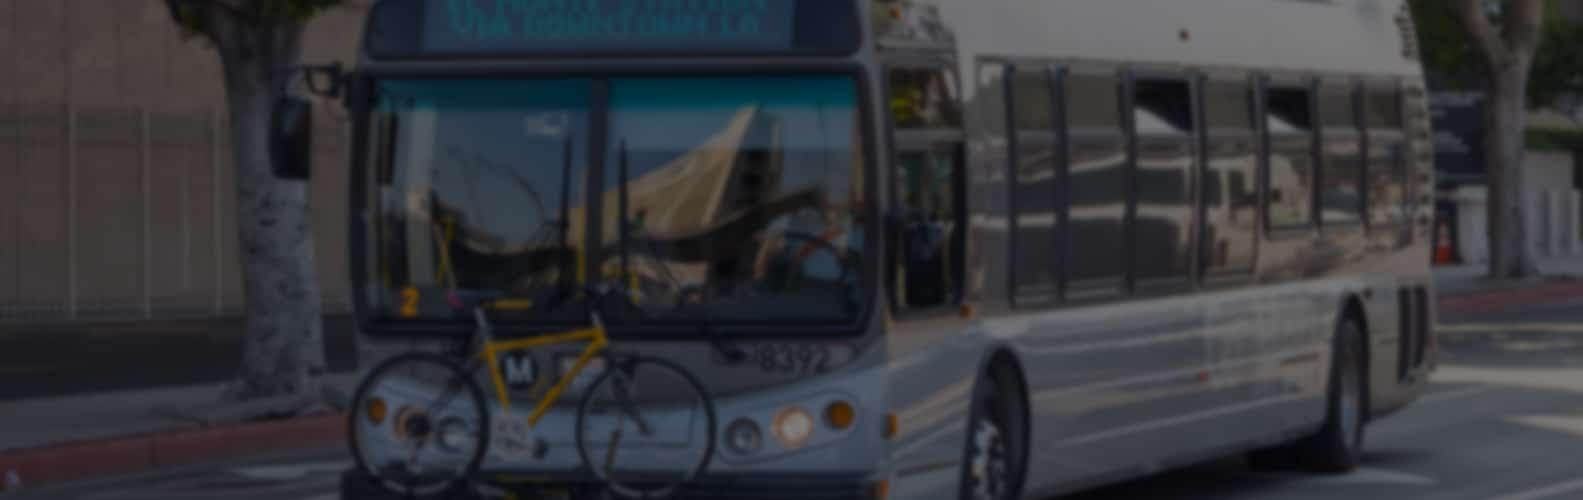 Orange County Bus Accident Lawyer